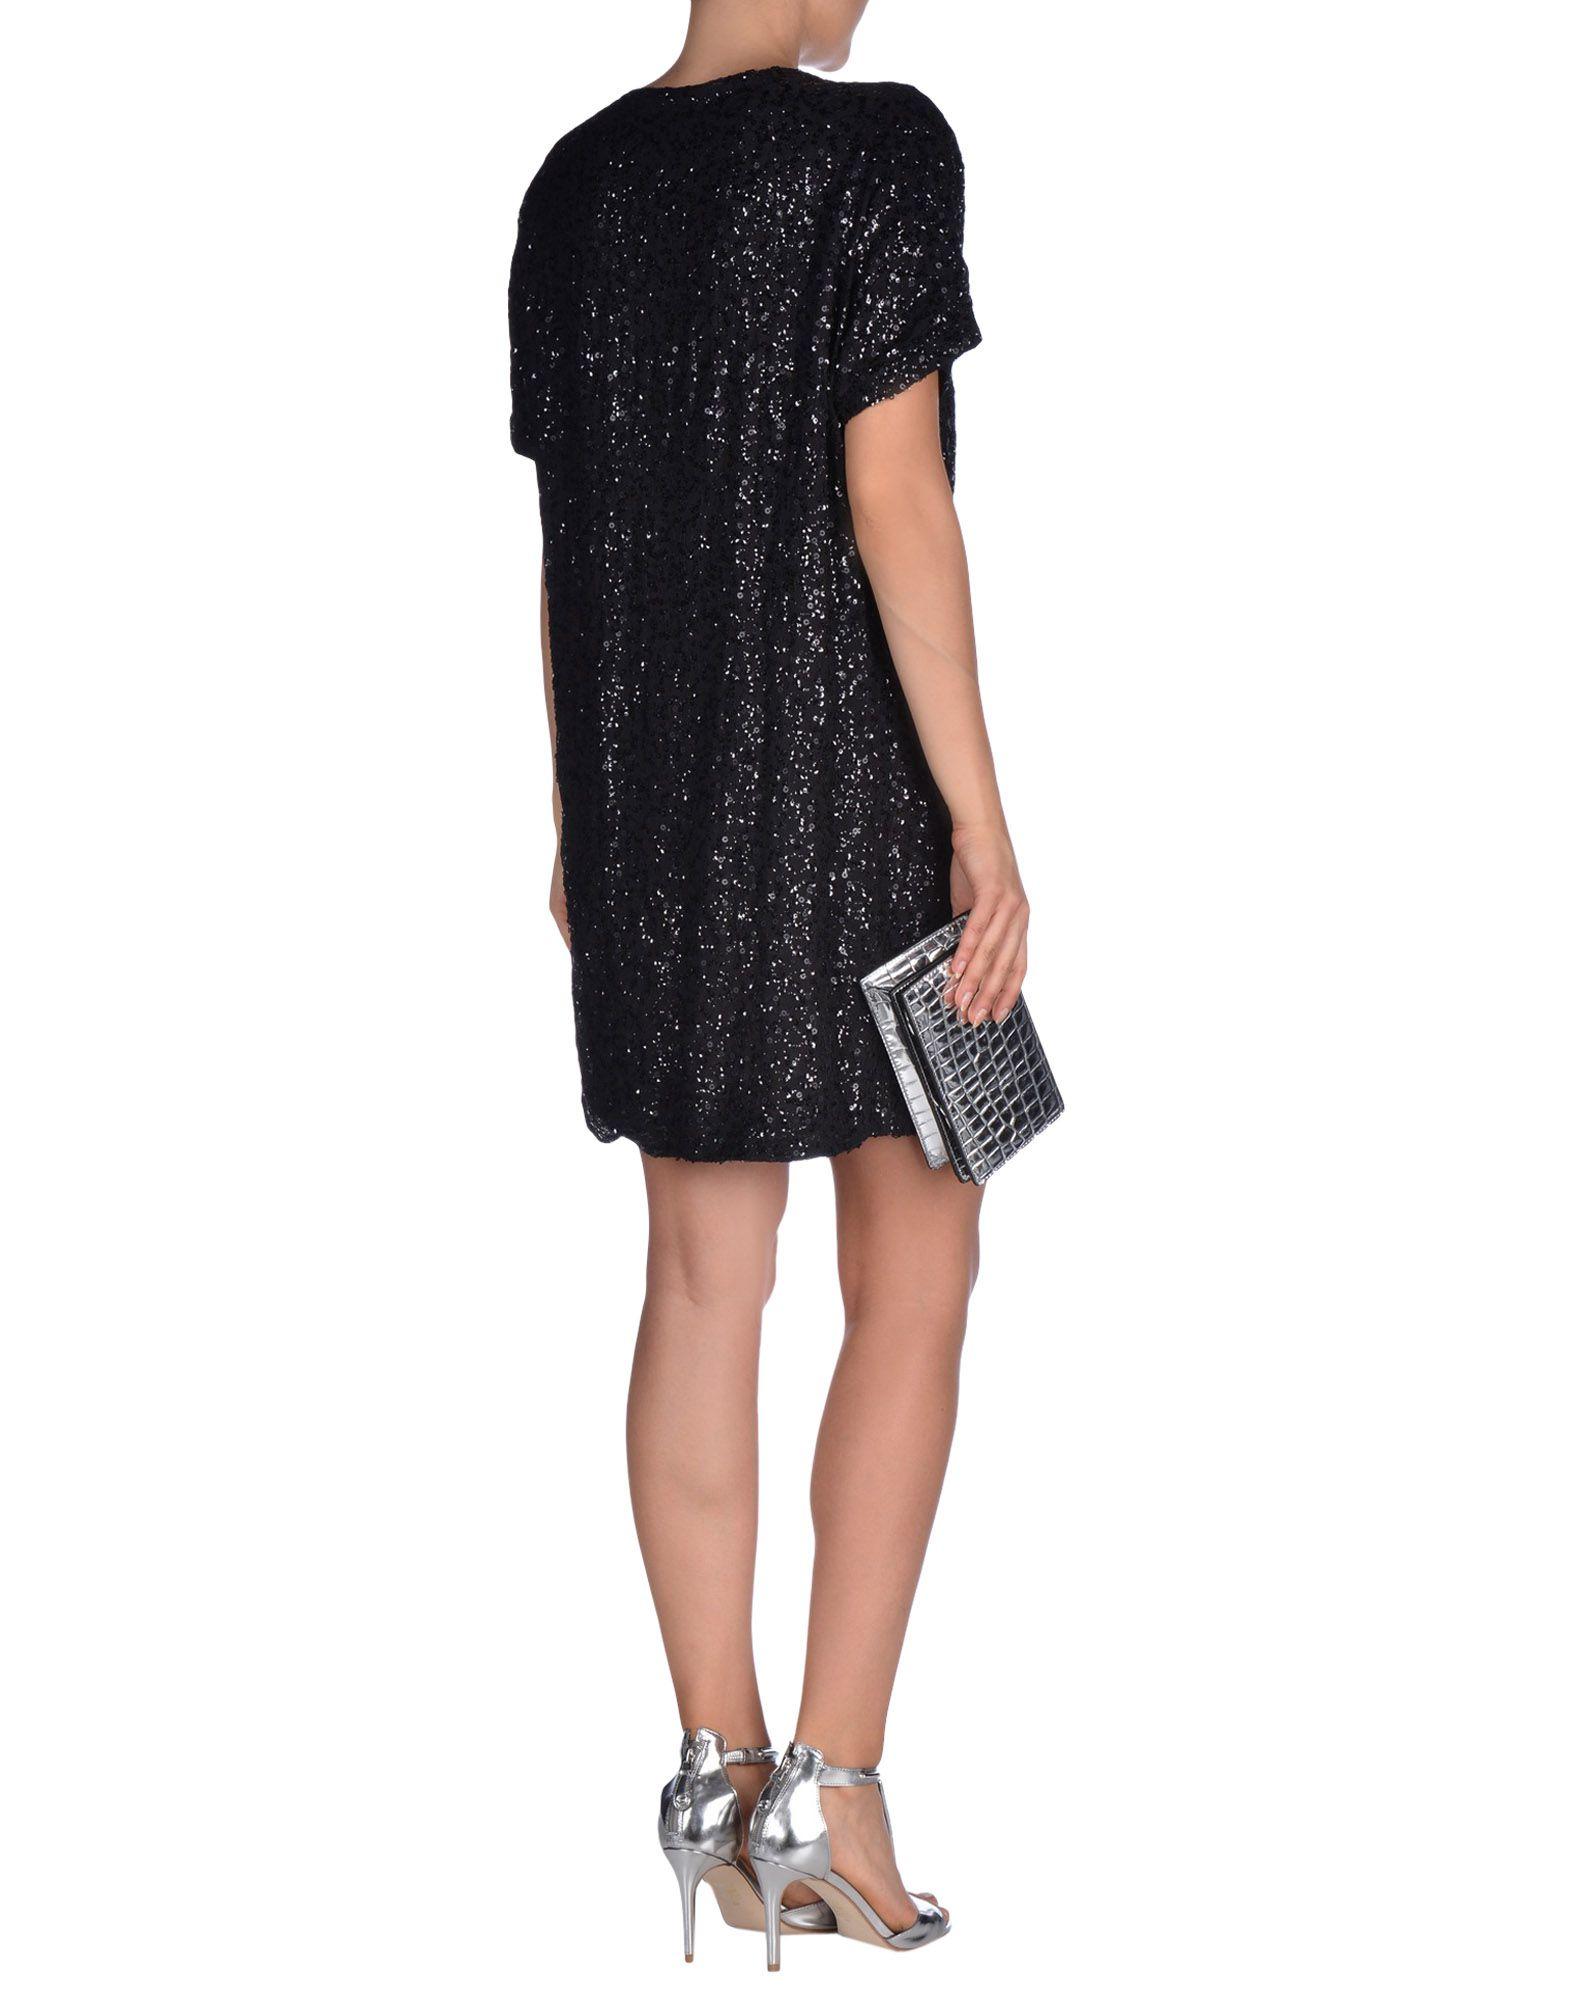 Creative Michael Michael Kors Long-sleeve Dress In Black | Lyst